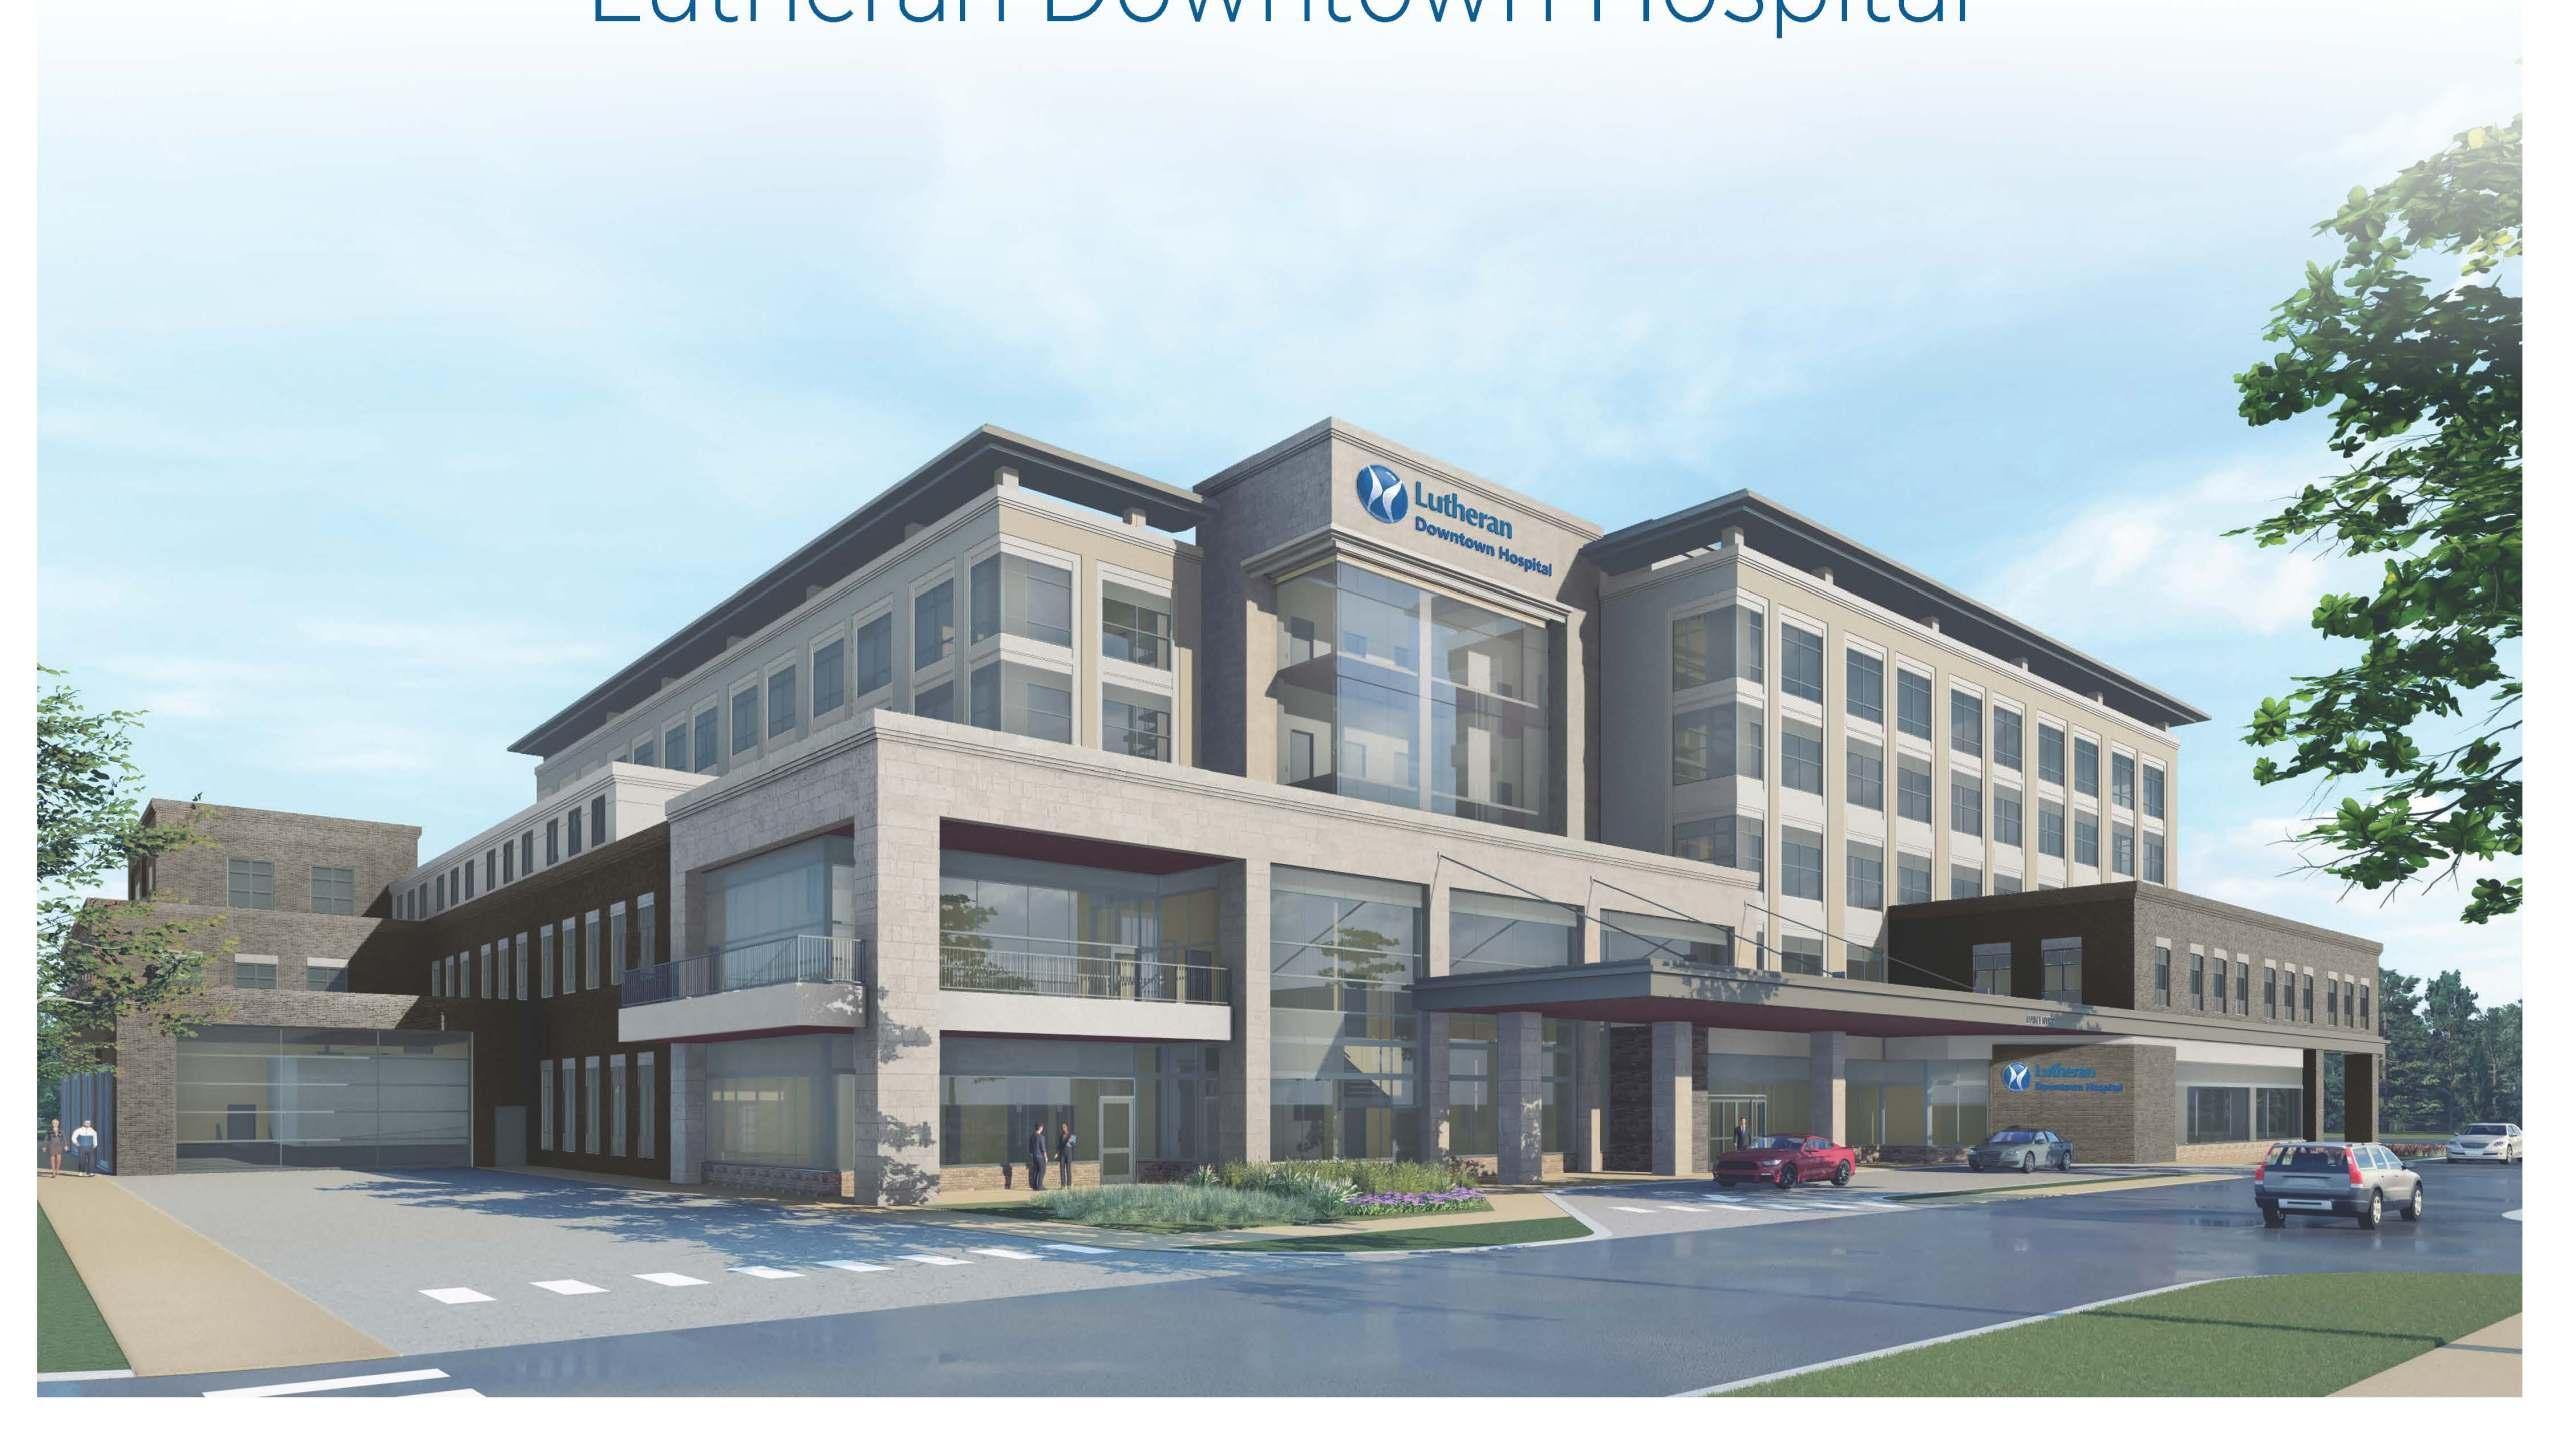 Lutheran Downtown Hospital Updated Design_1556639710492.jpg.jpg